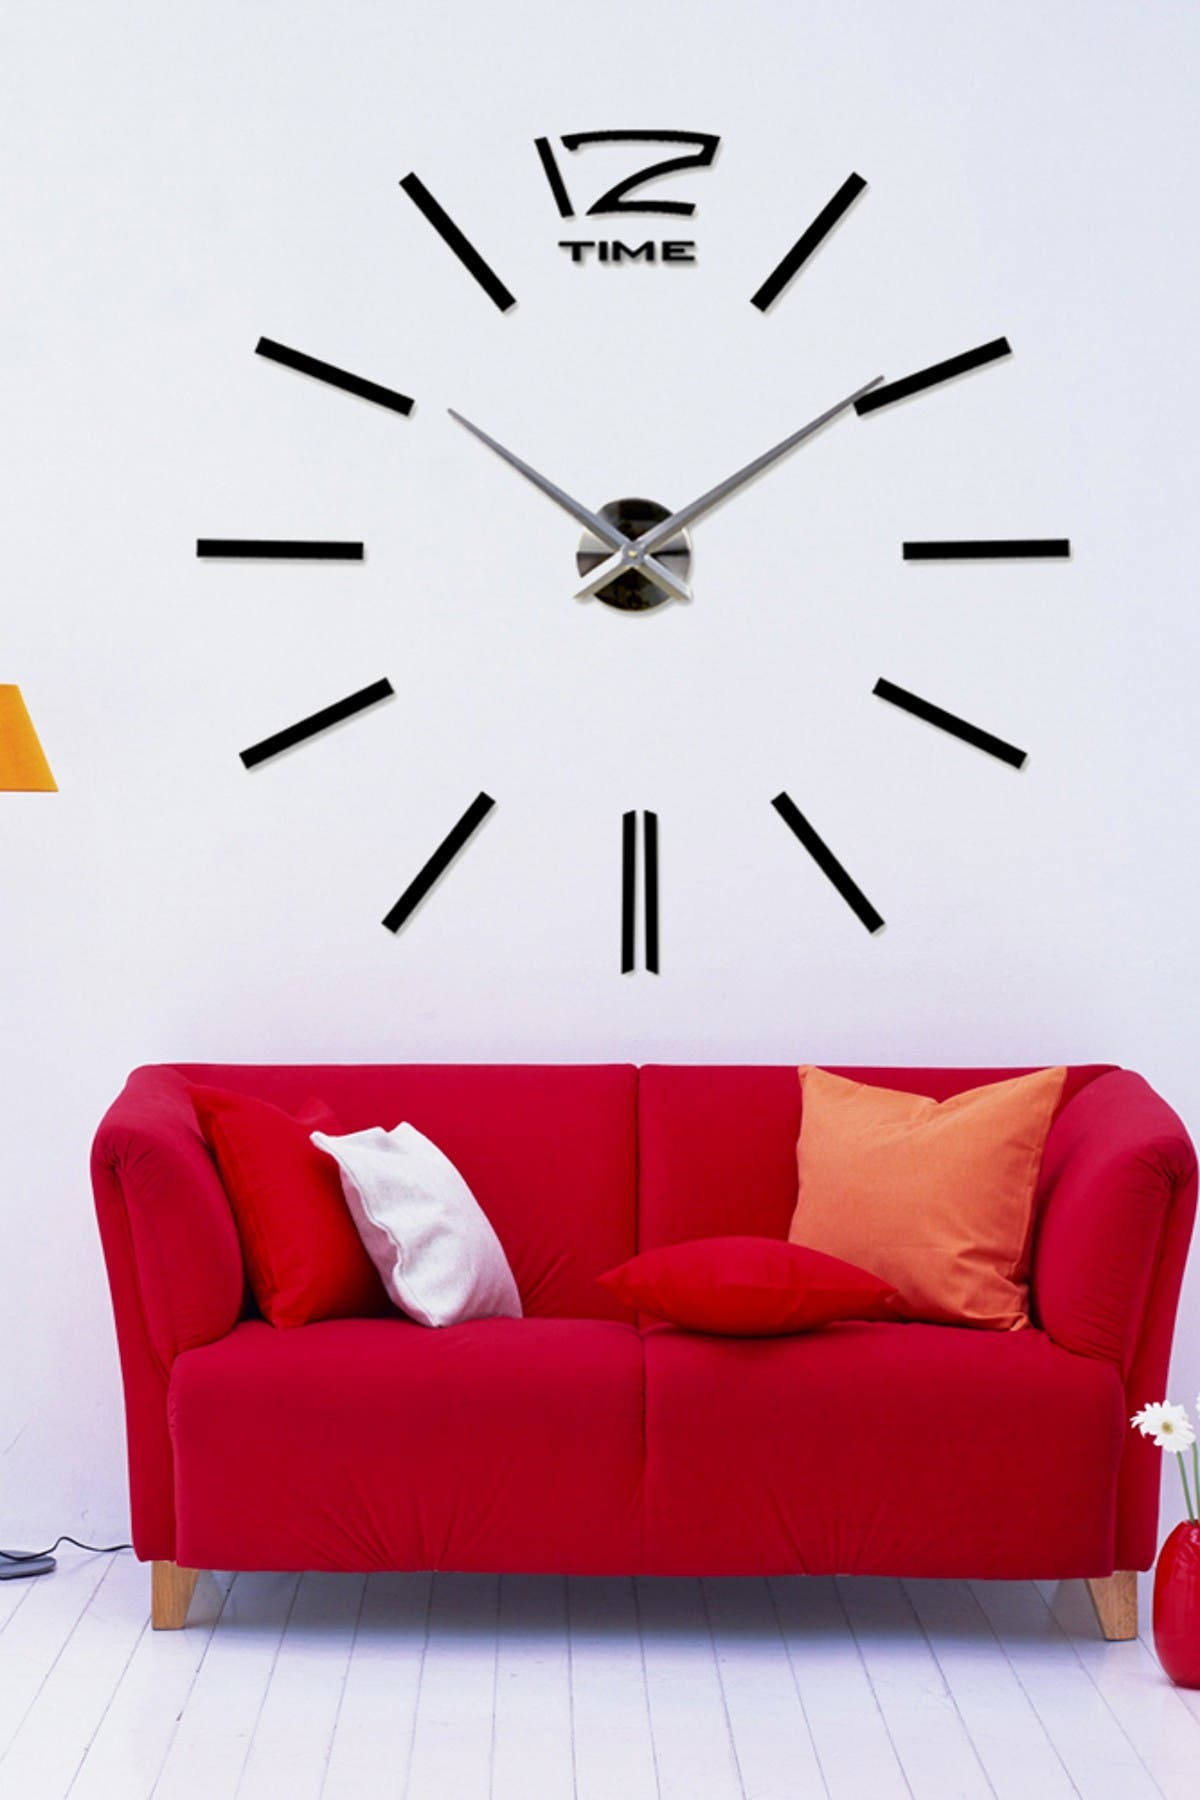 Image of WalPlus 3D Giant Wall Clock Black Decal